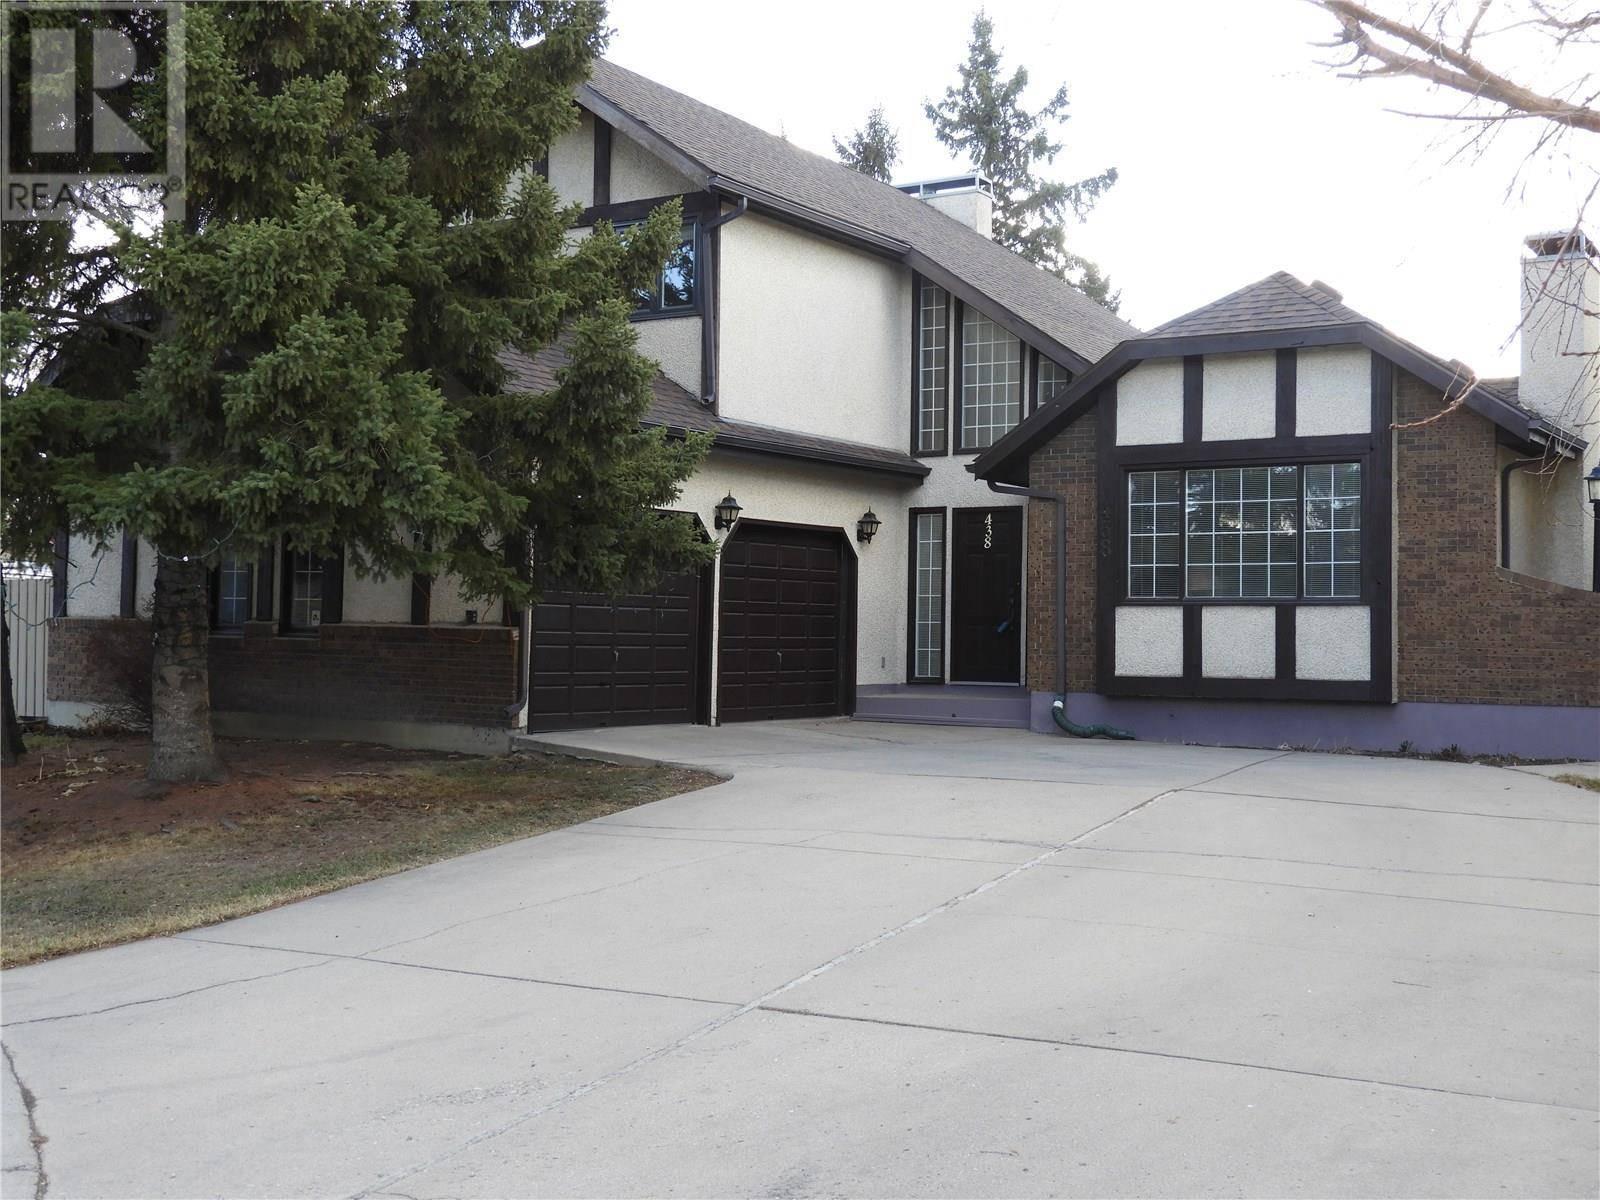 House for sale at 438 Charlebois Ter  Saskatoon Saskatchewan - MLS: SK766476